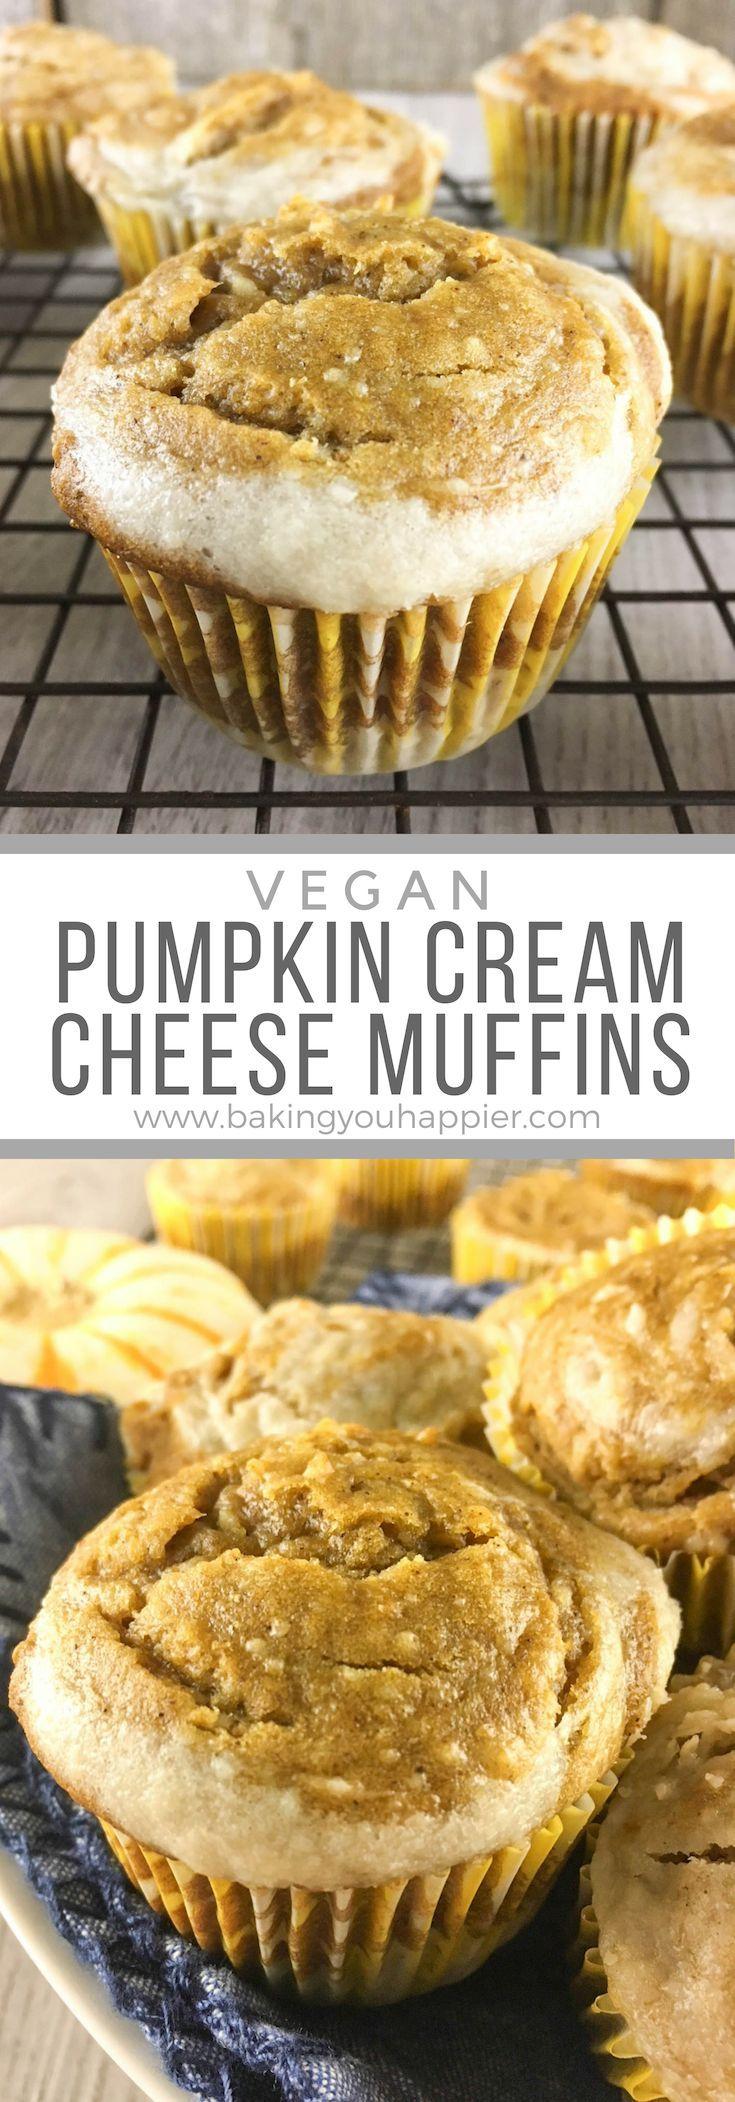 Vegan Pumpkin Cream Cheese Muffins #creamcheeserecipes